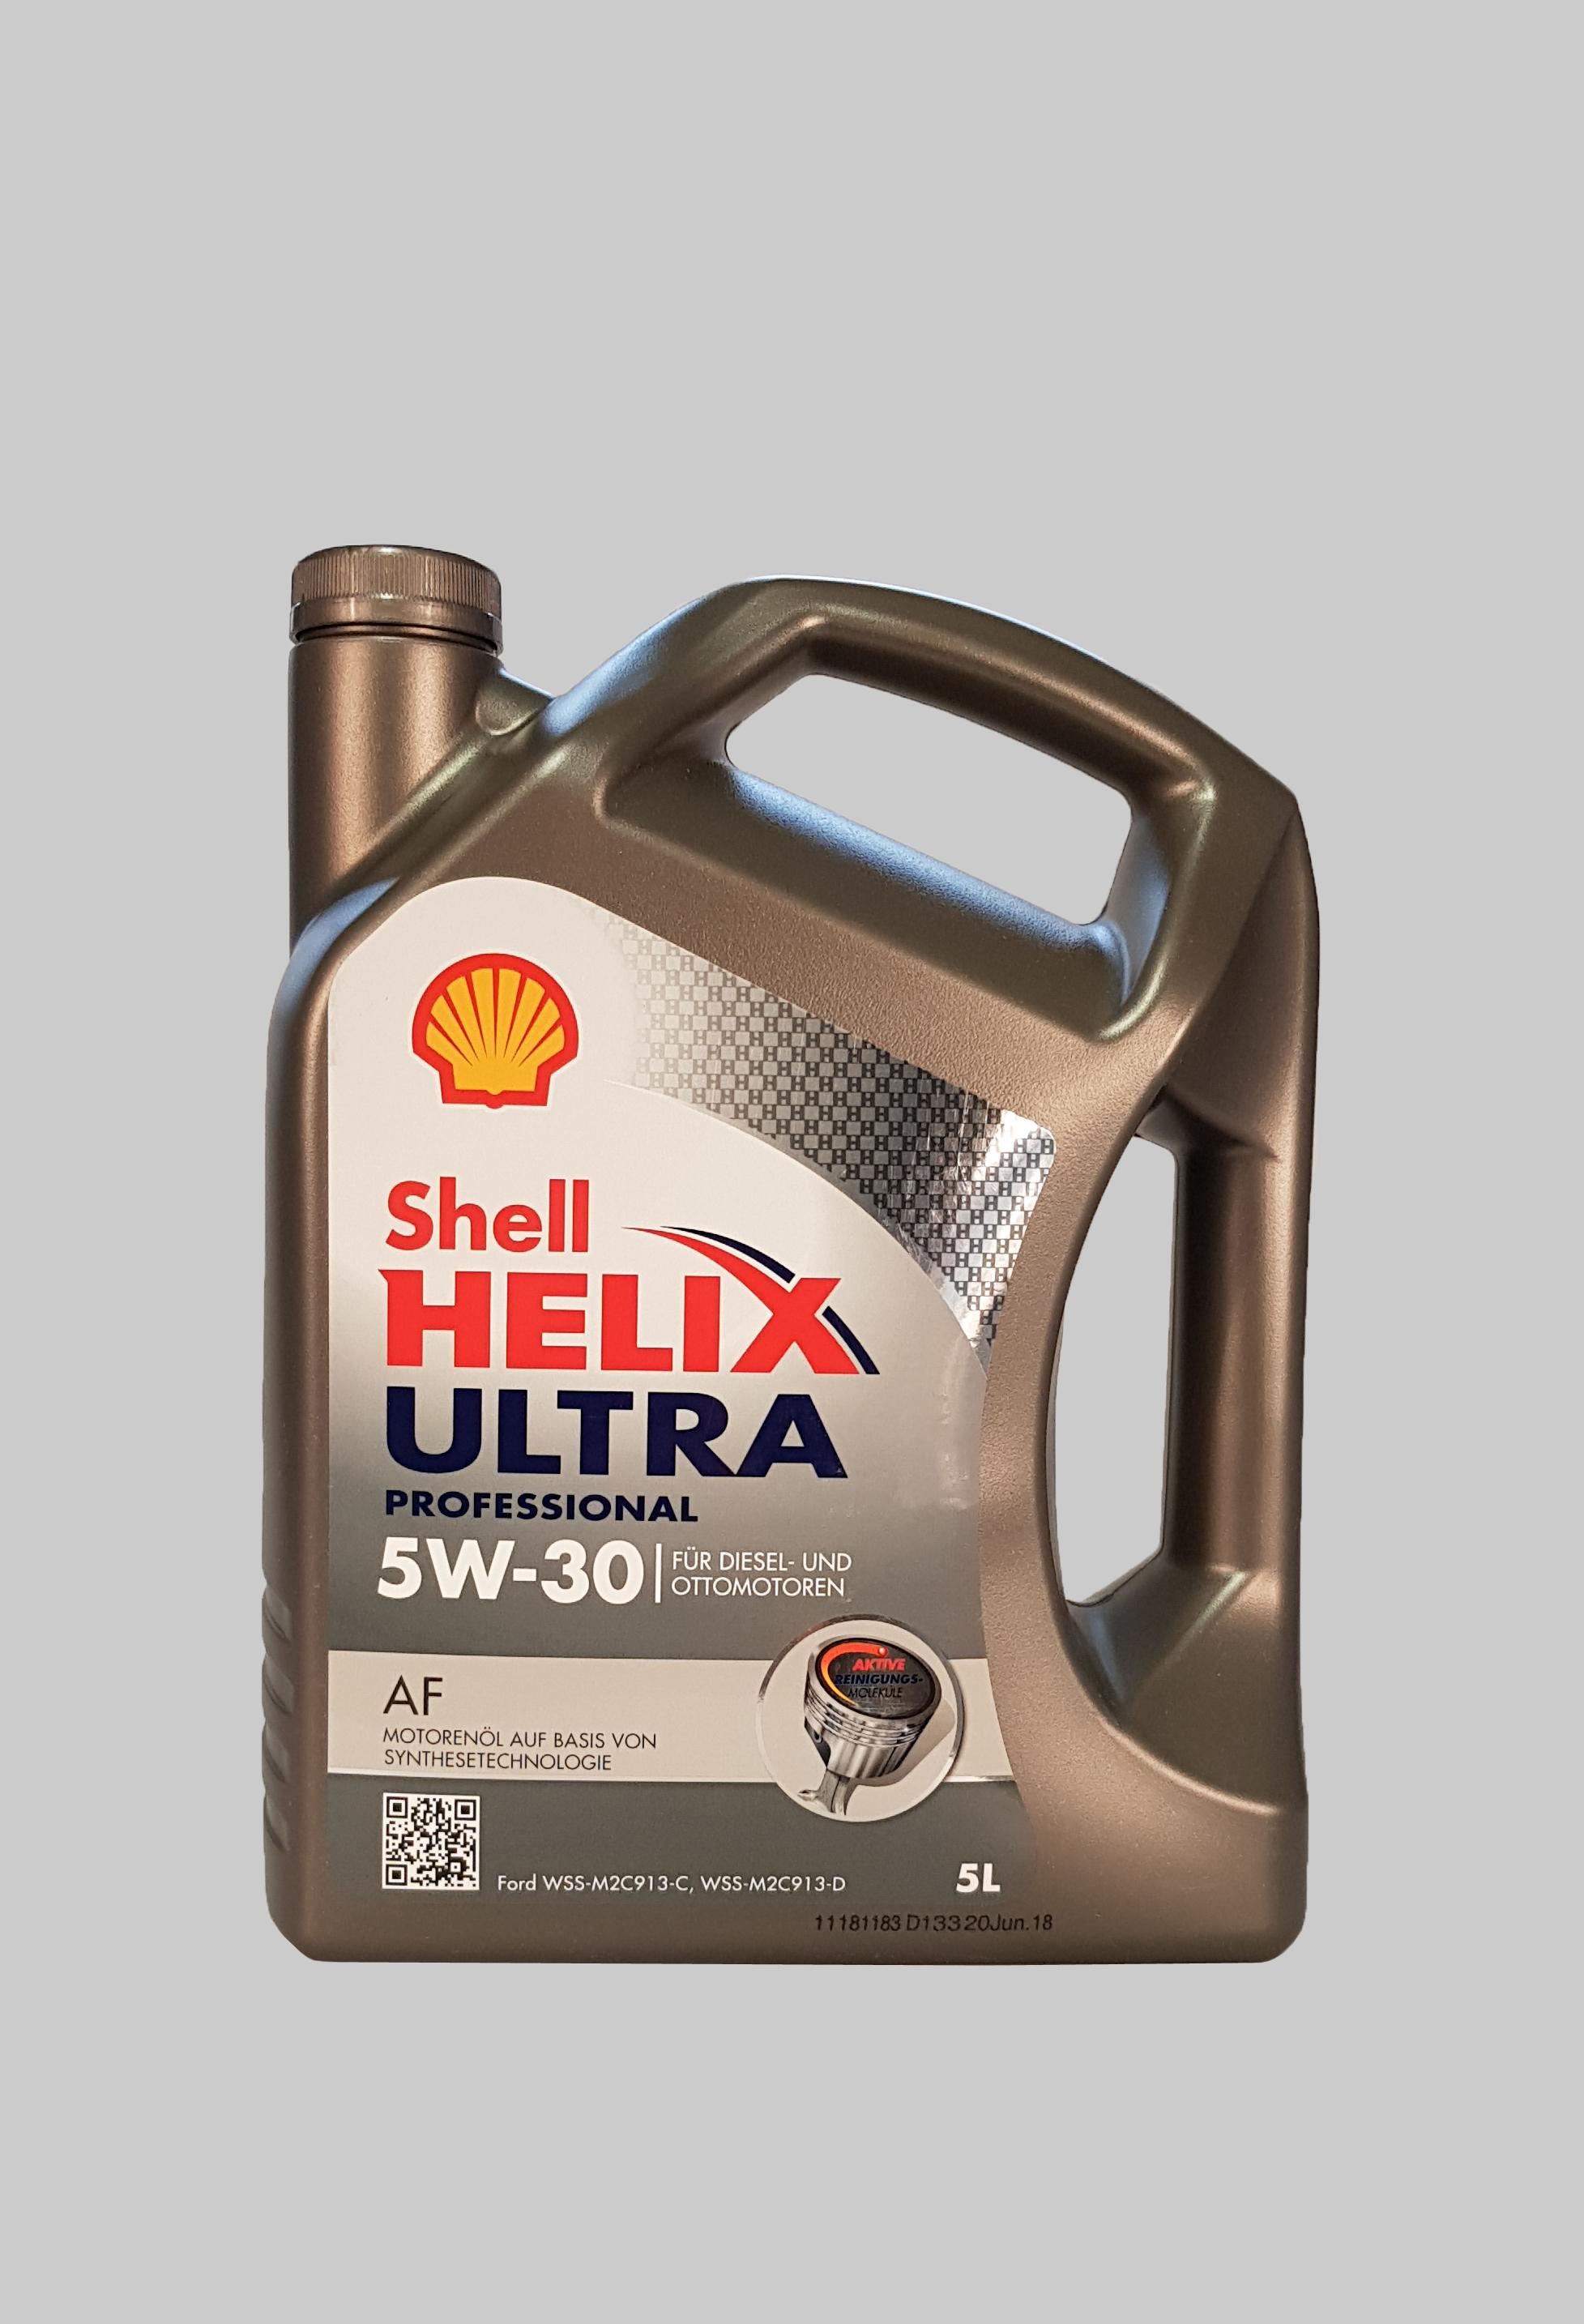 Shell Helix Ultra Professional AF 5W-30 5 Liter